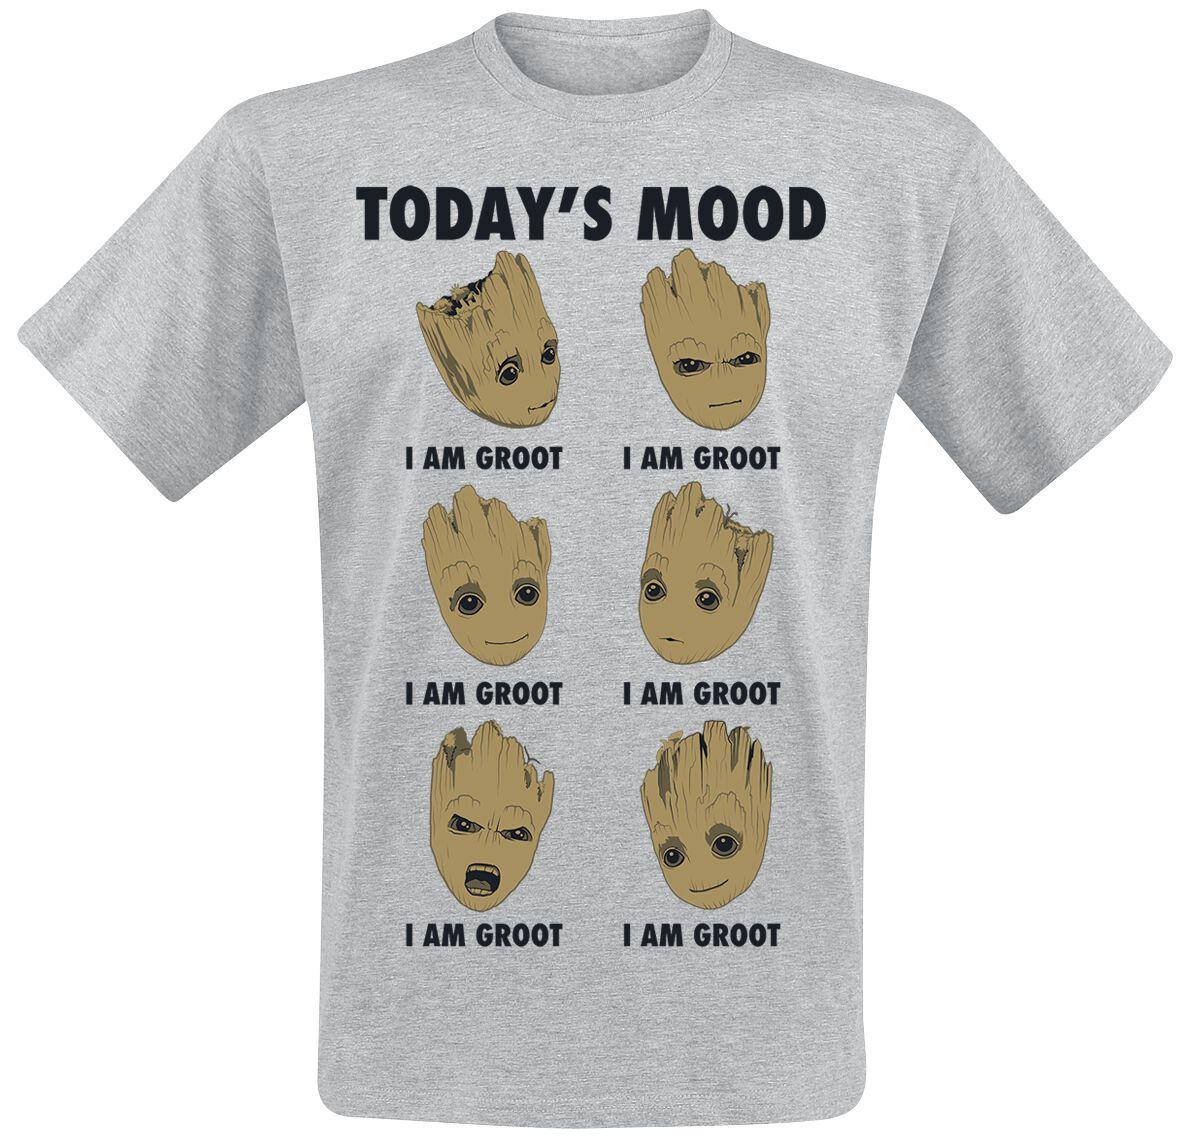 29cdb111c 2 - Groot Today's Mood | Guardians Of The Galaxy T-Shirt | EMP